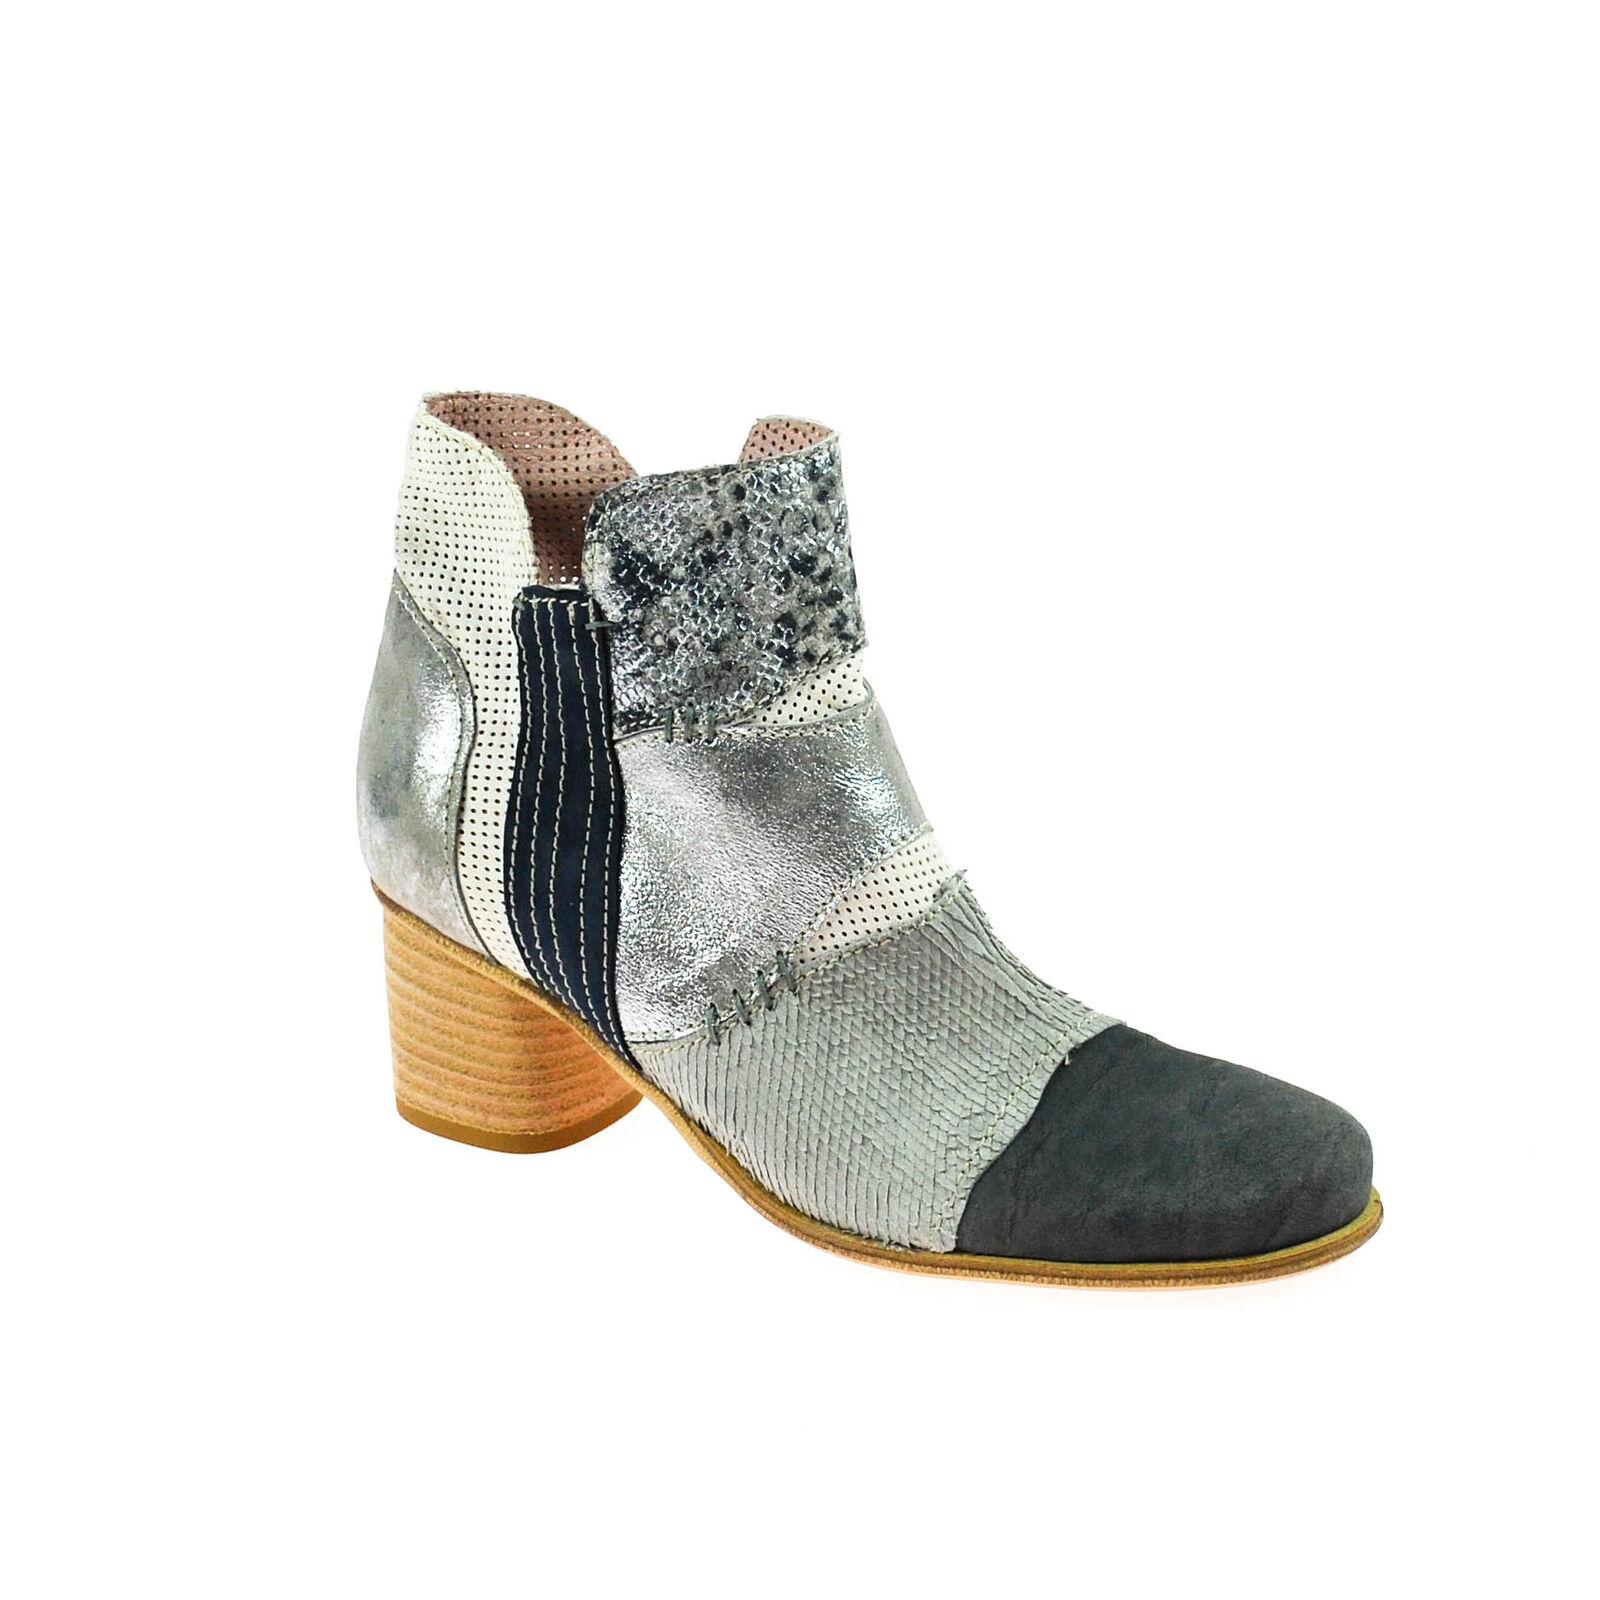 Gabor Shoes 65.14, Scarpe (River con Tacco Donna, Blu (River Scarpe 46), 37 EU (T0d) 8a3135